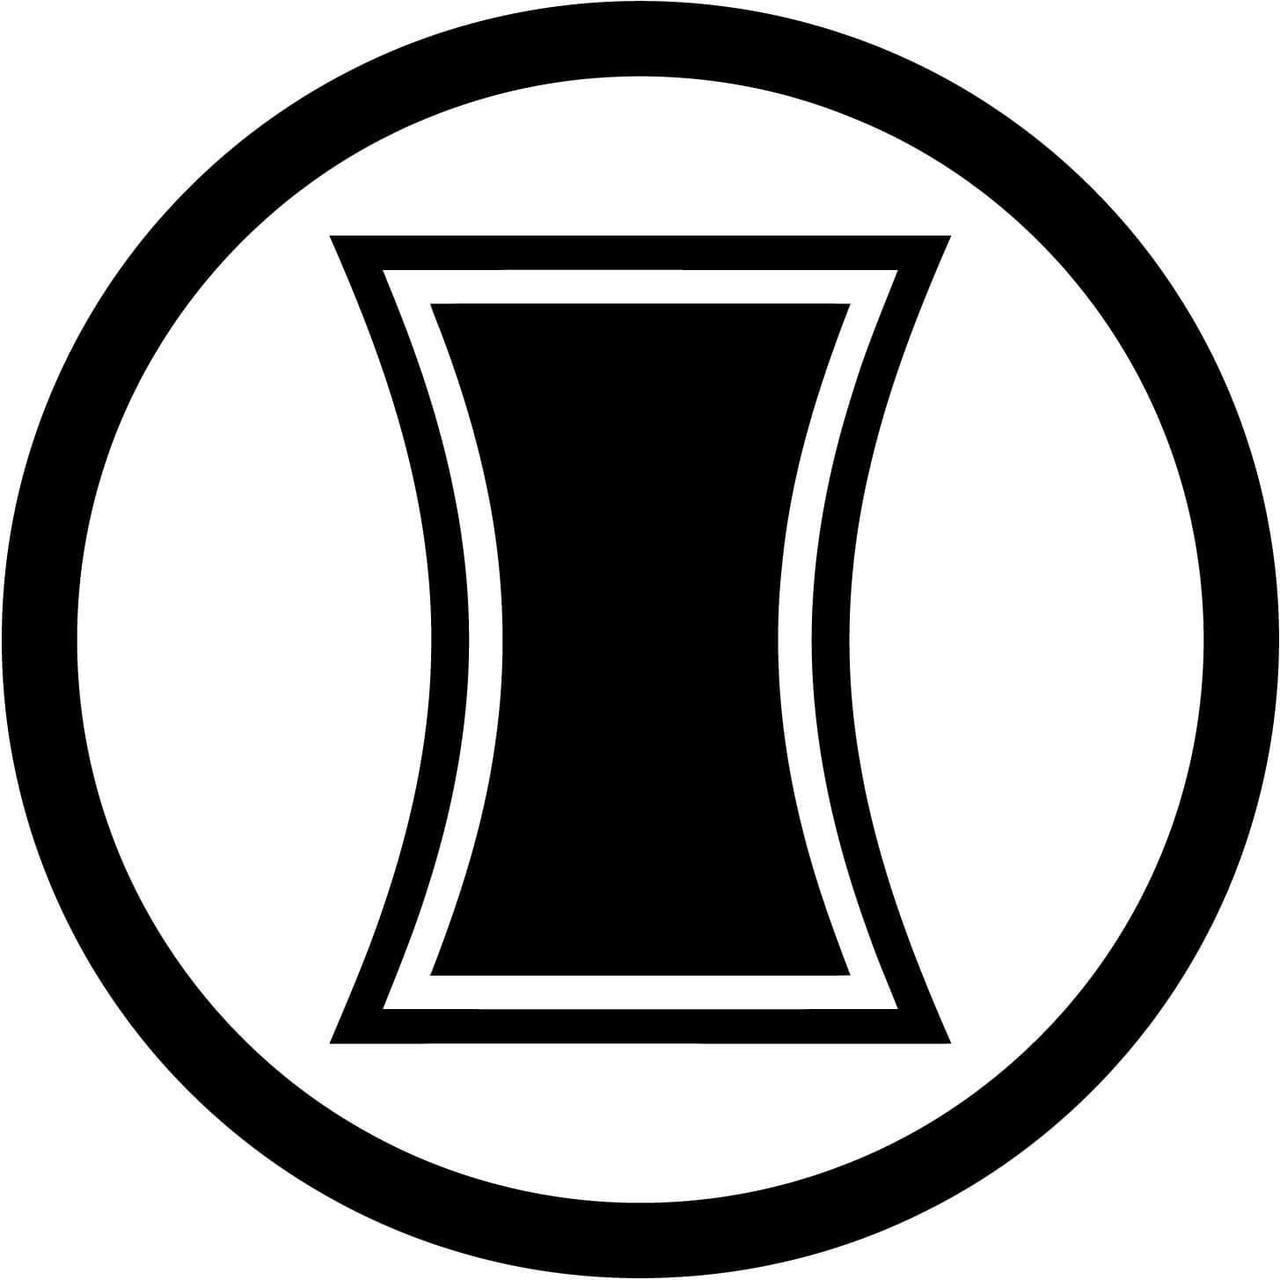 Black widow symbol clipart image royalty free stock Marvel Comics Avengers Black Widow Symbol image royalty free stock